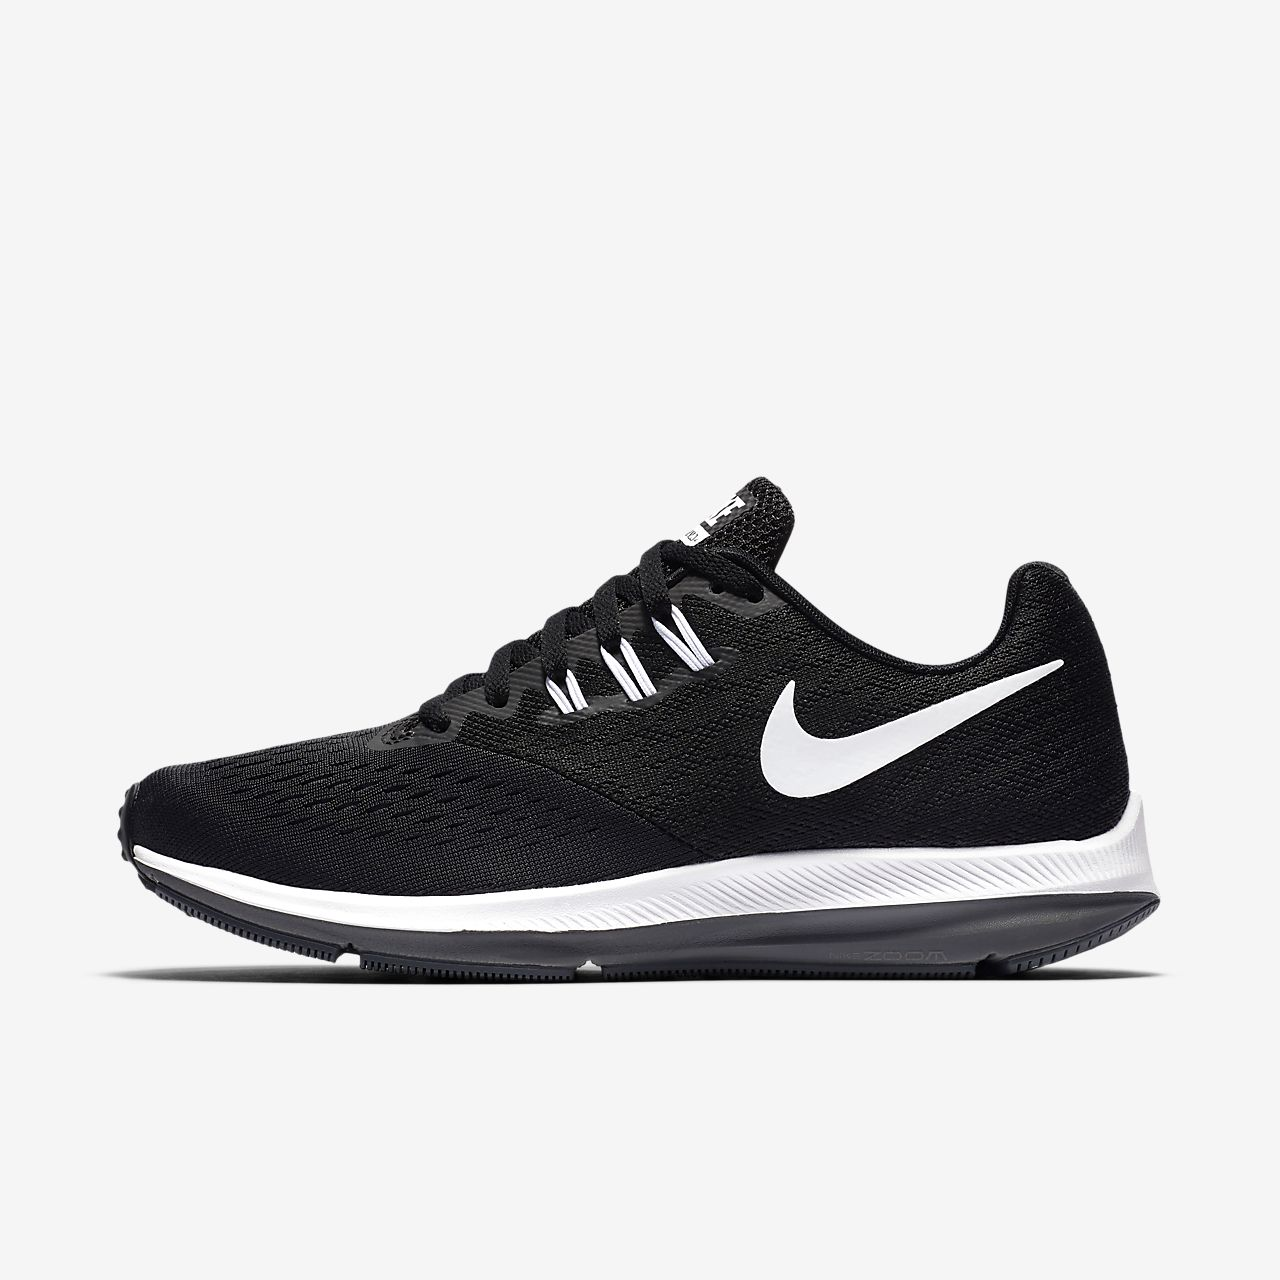 scarpe 37.5 nike